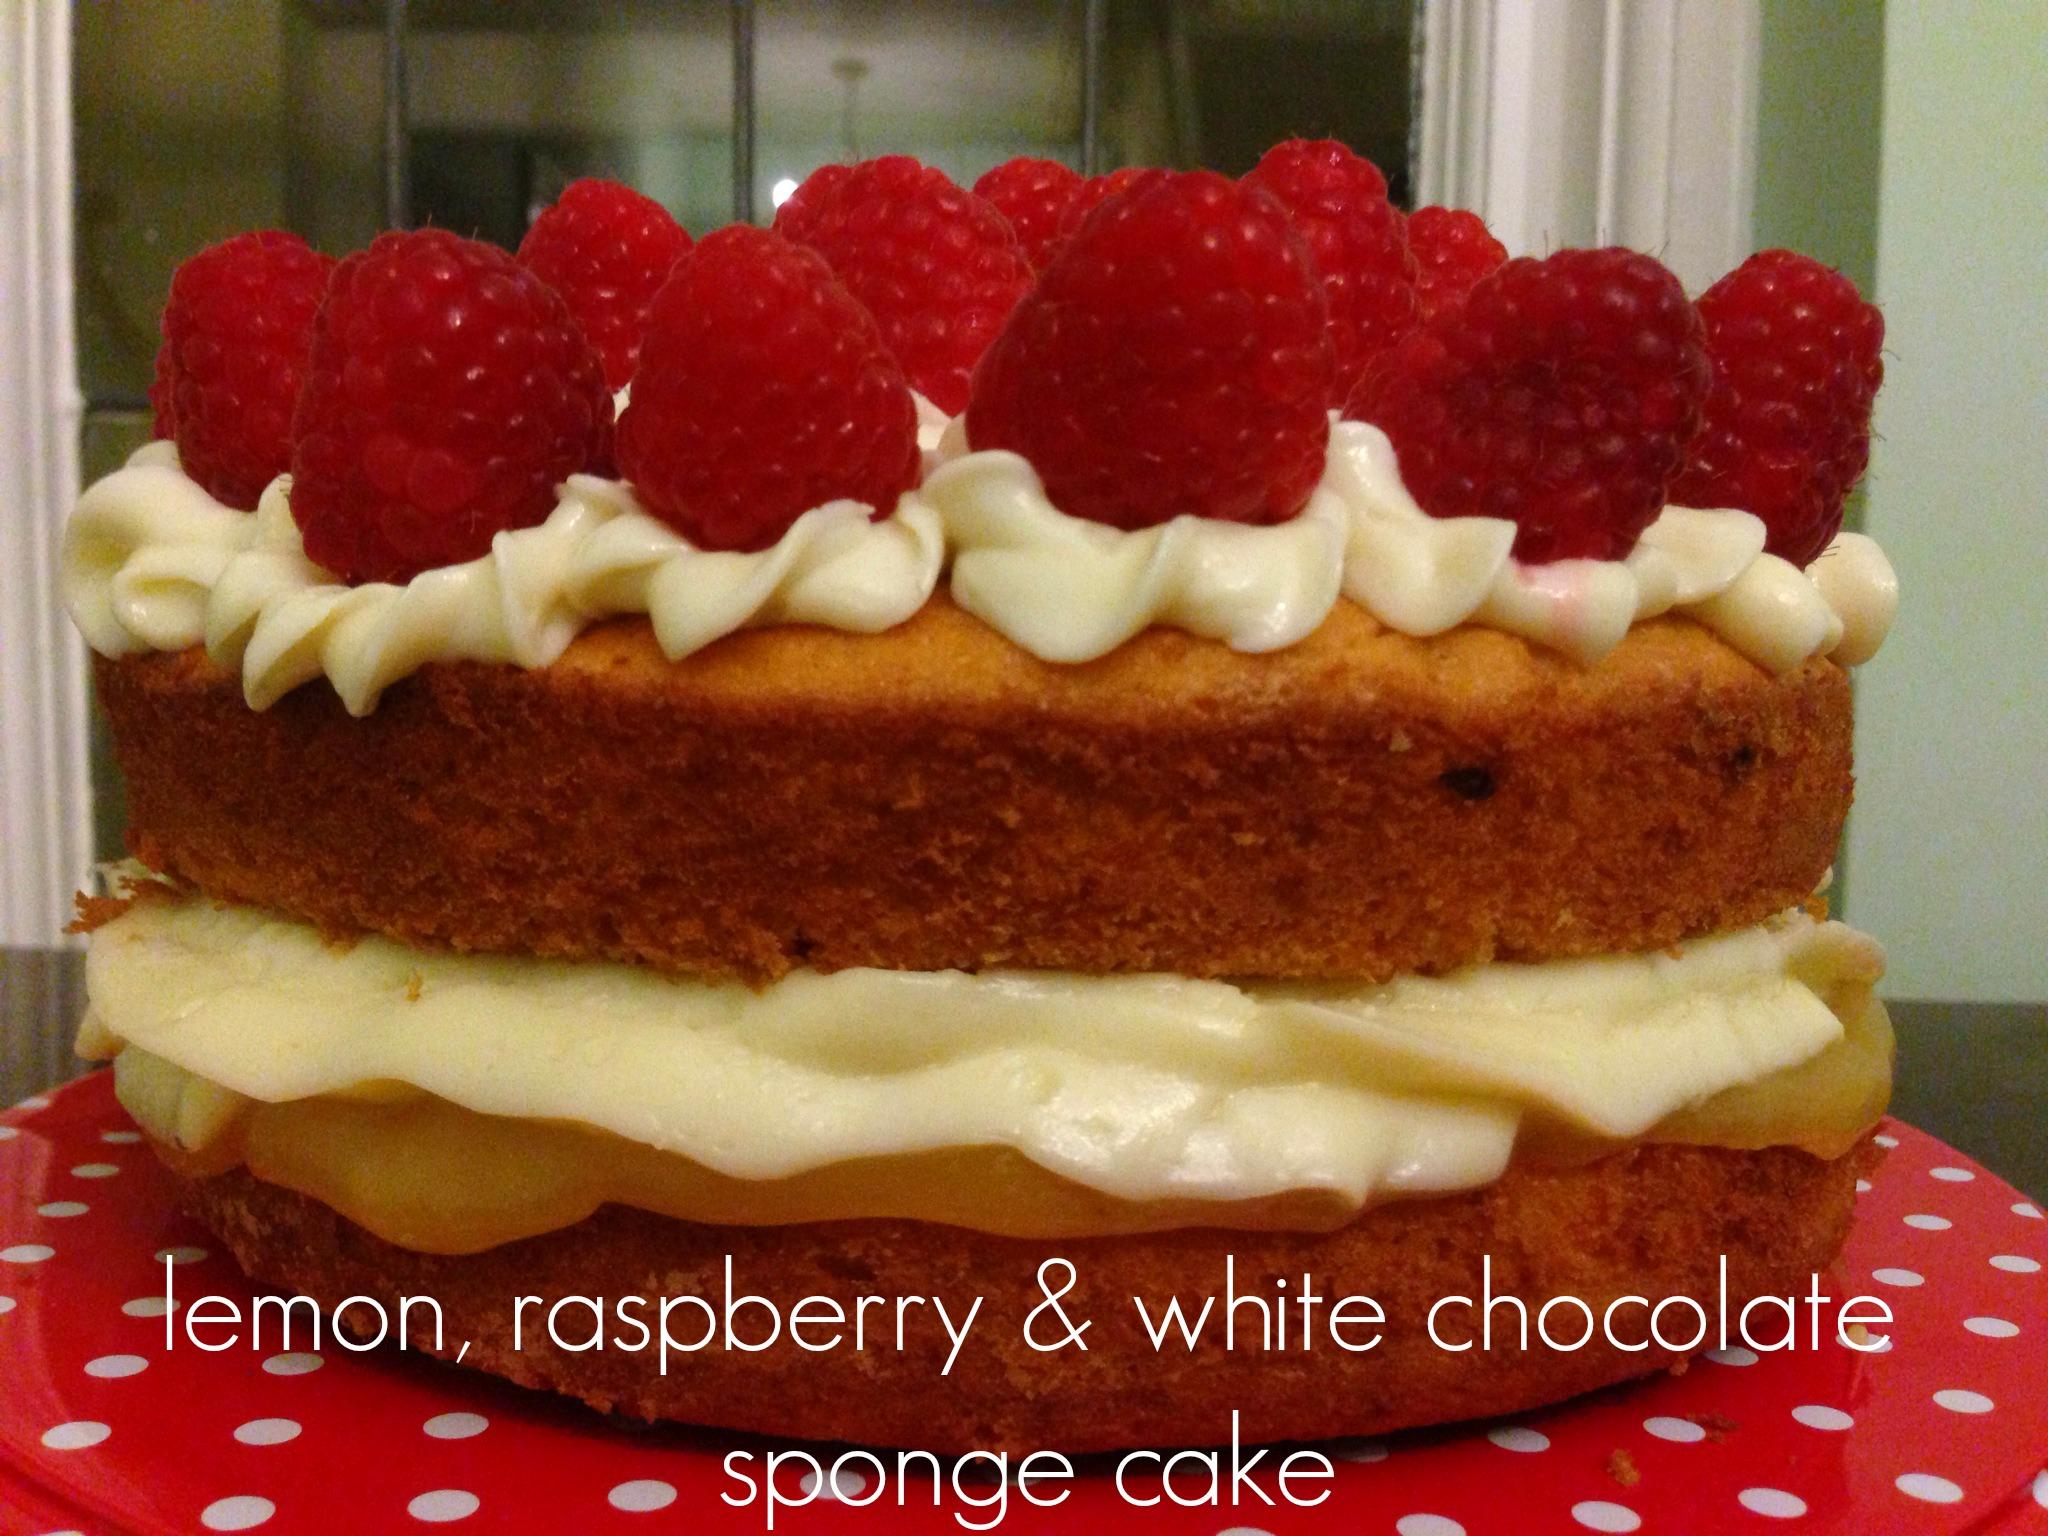 White Chocolate Cake Recipes Uk: Lemon, Raspberry & White Chocolate Sponge Cake (GBBO #1